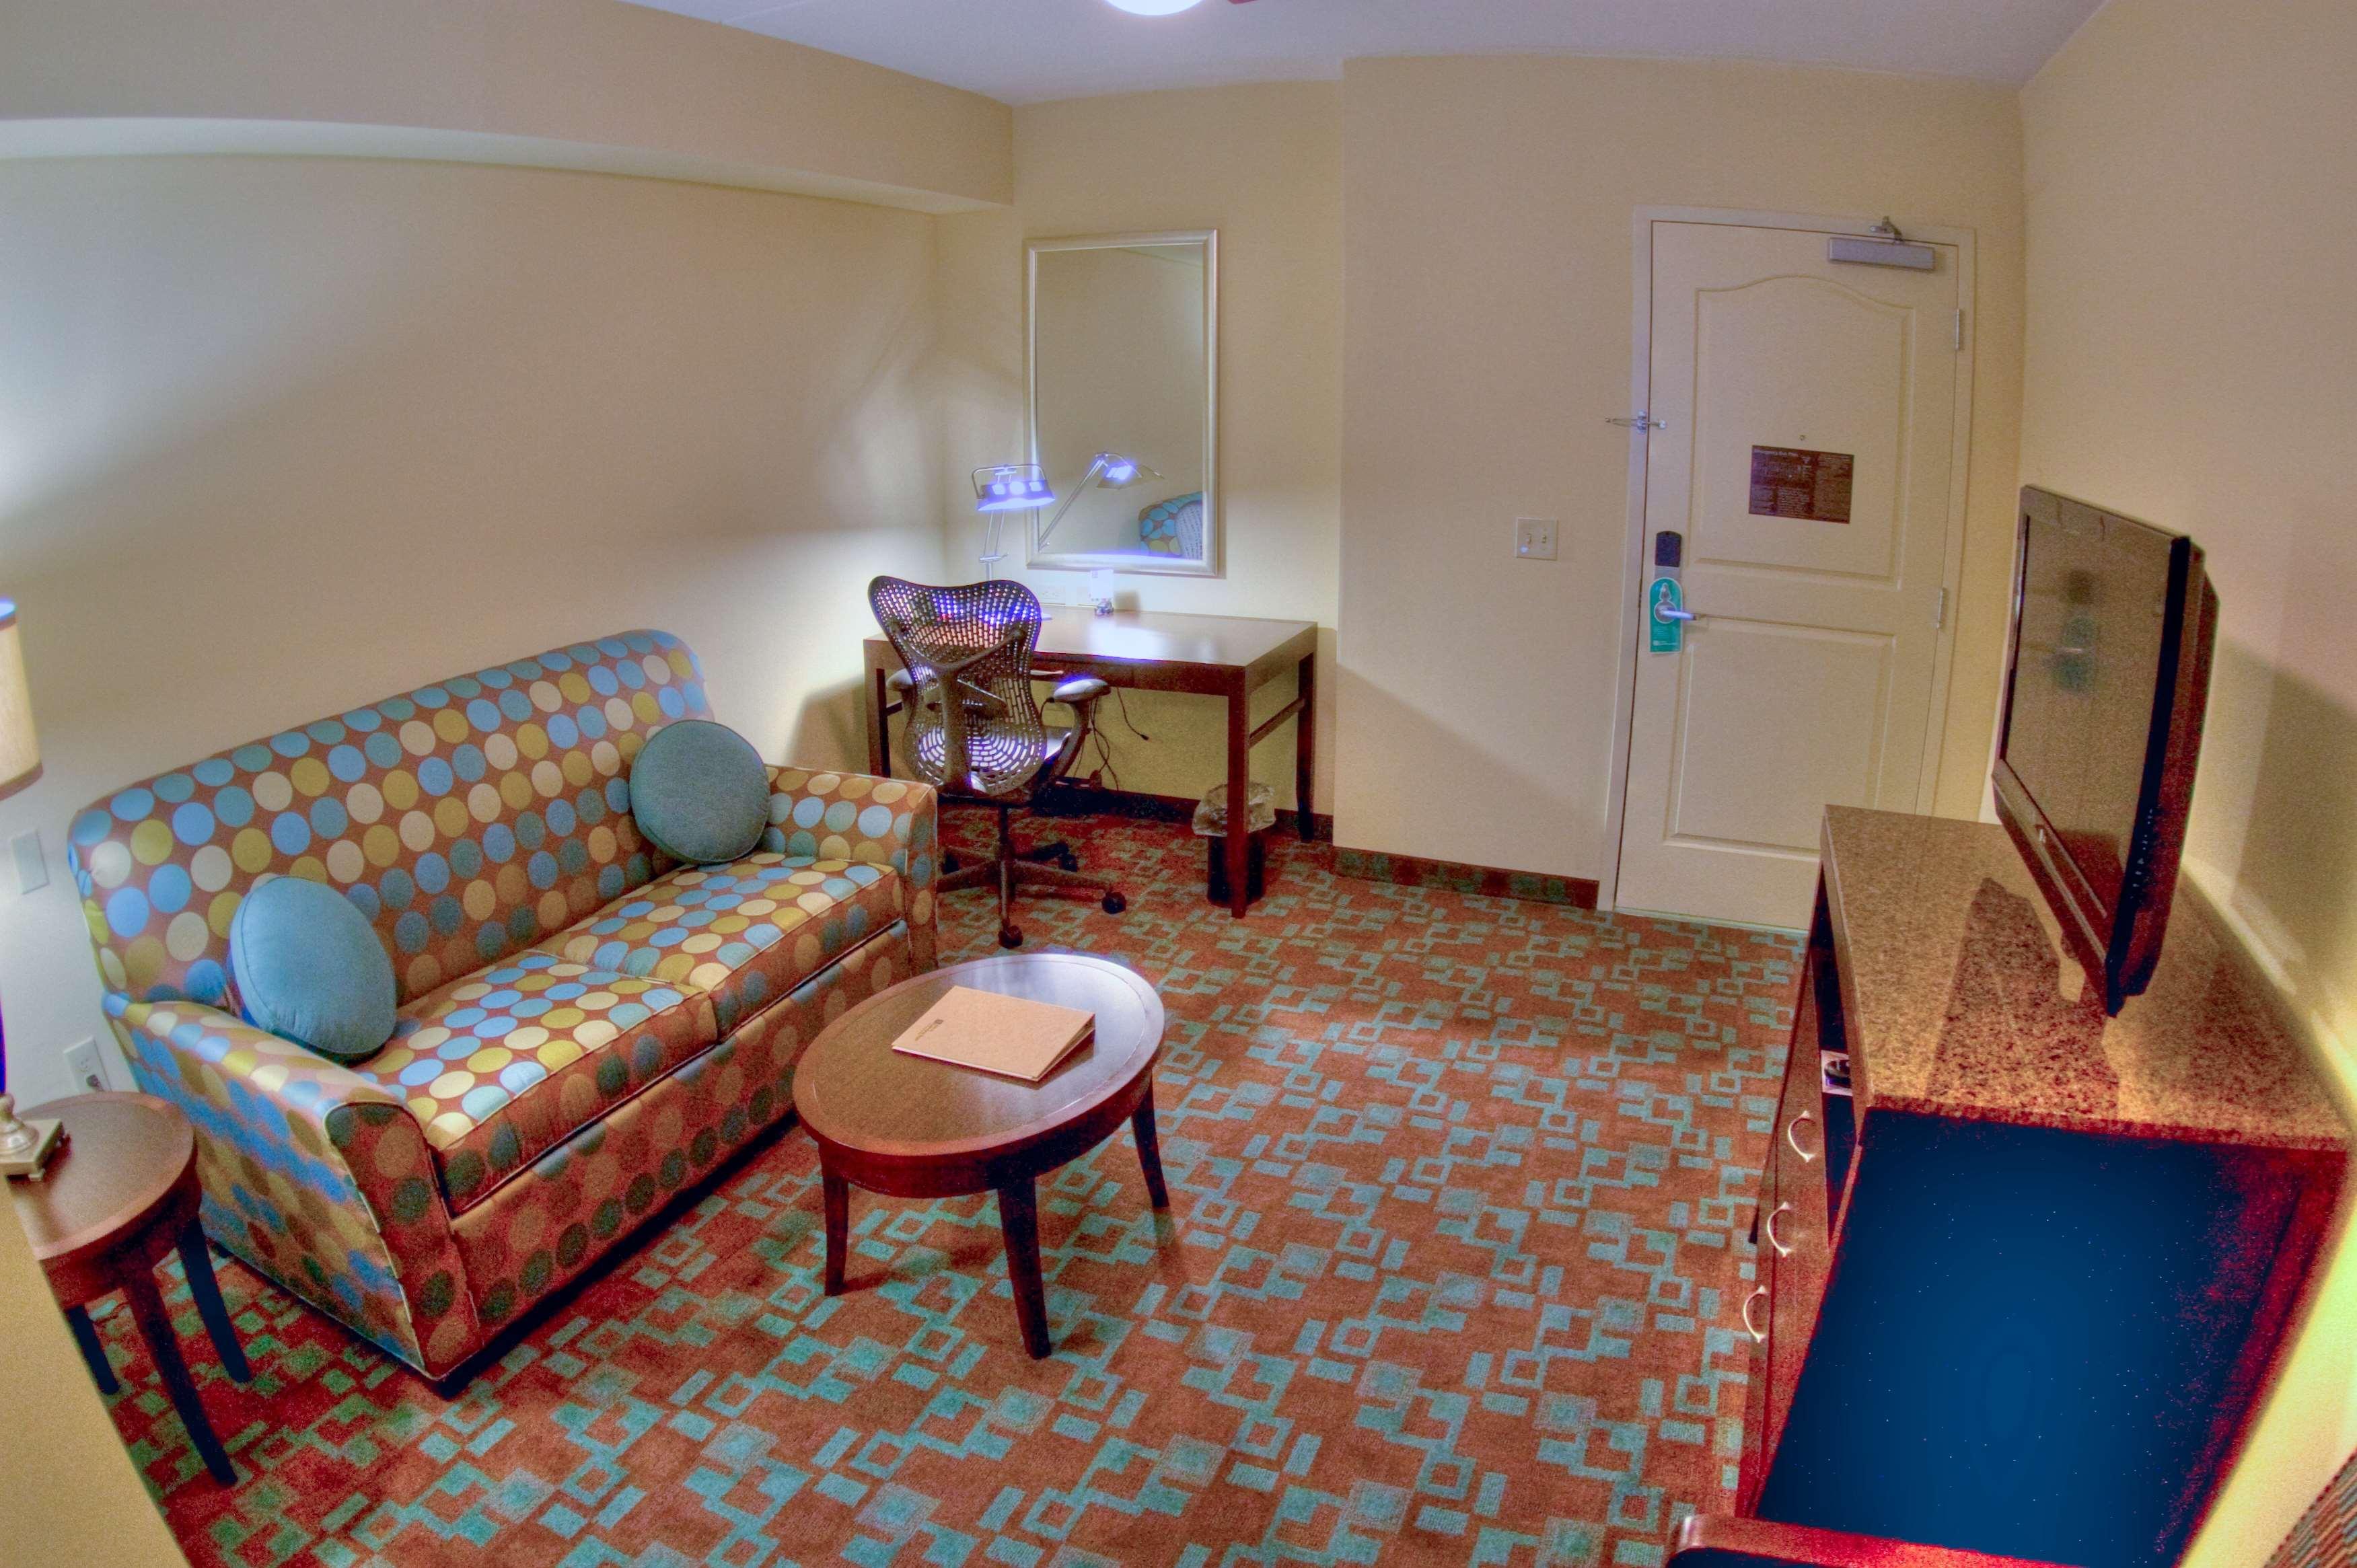 Hilton Garden Inn Clarksville image 42